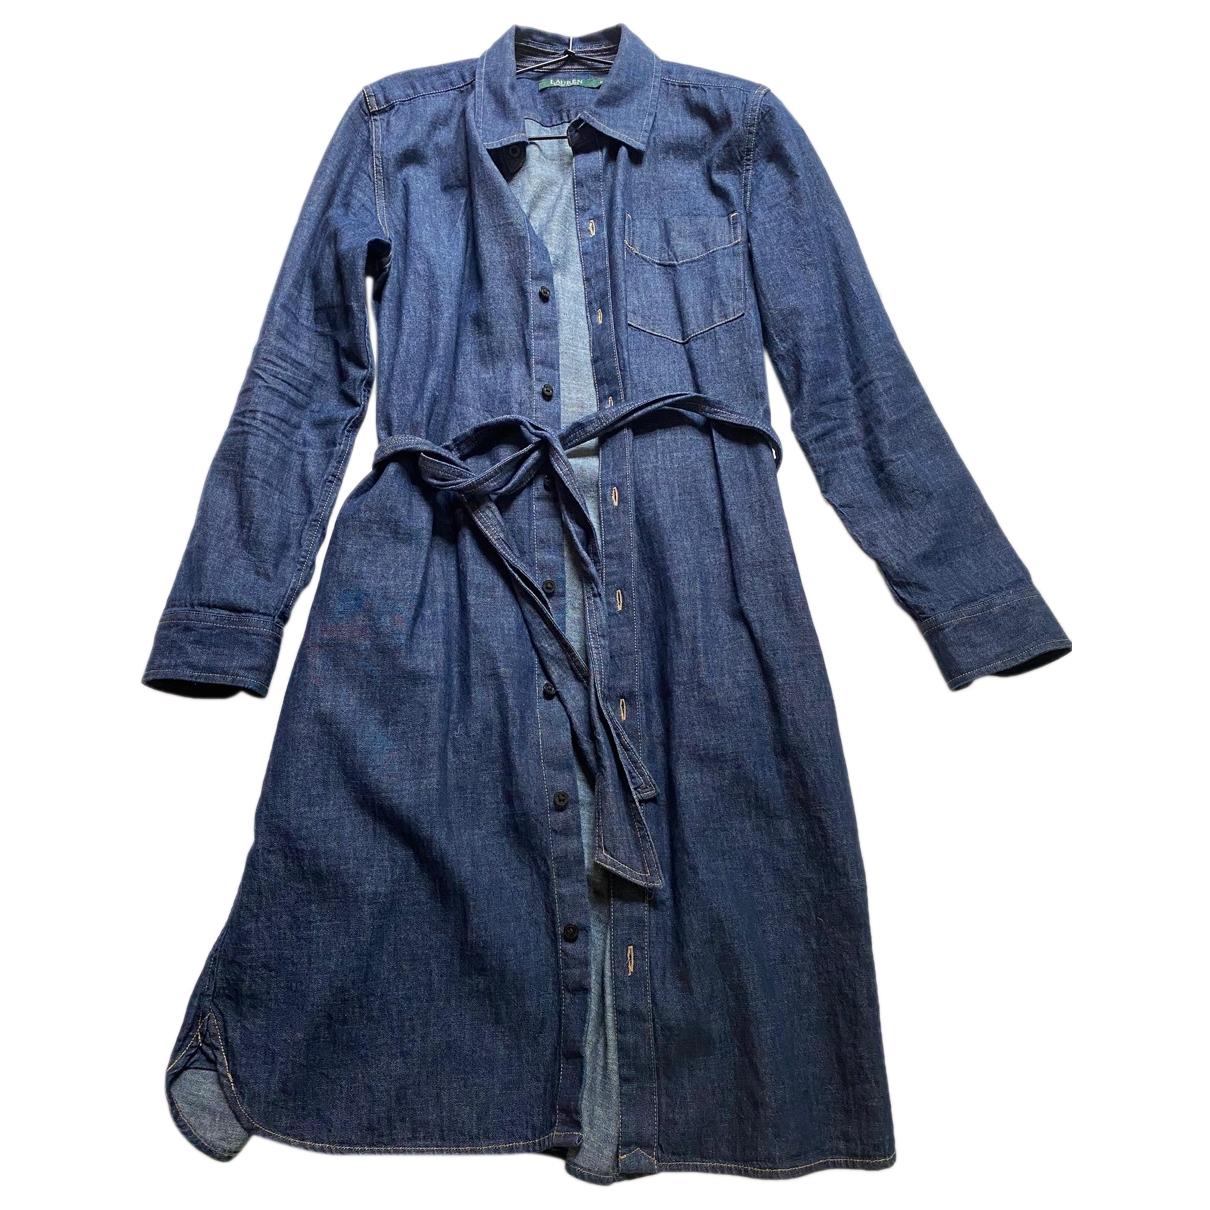 Lauren Ralph Lauren \N Blue Denim - Jeans dress for Women M International